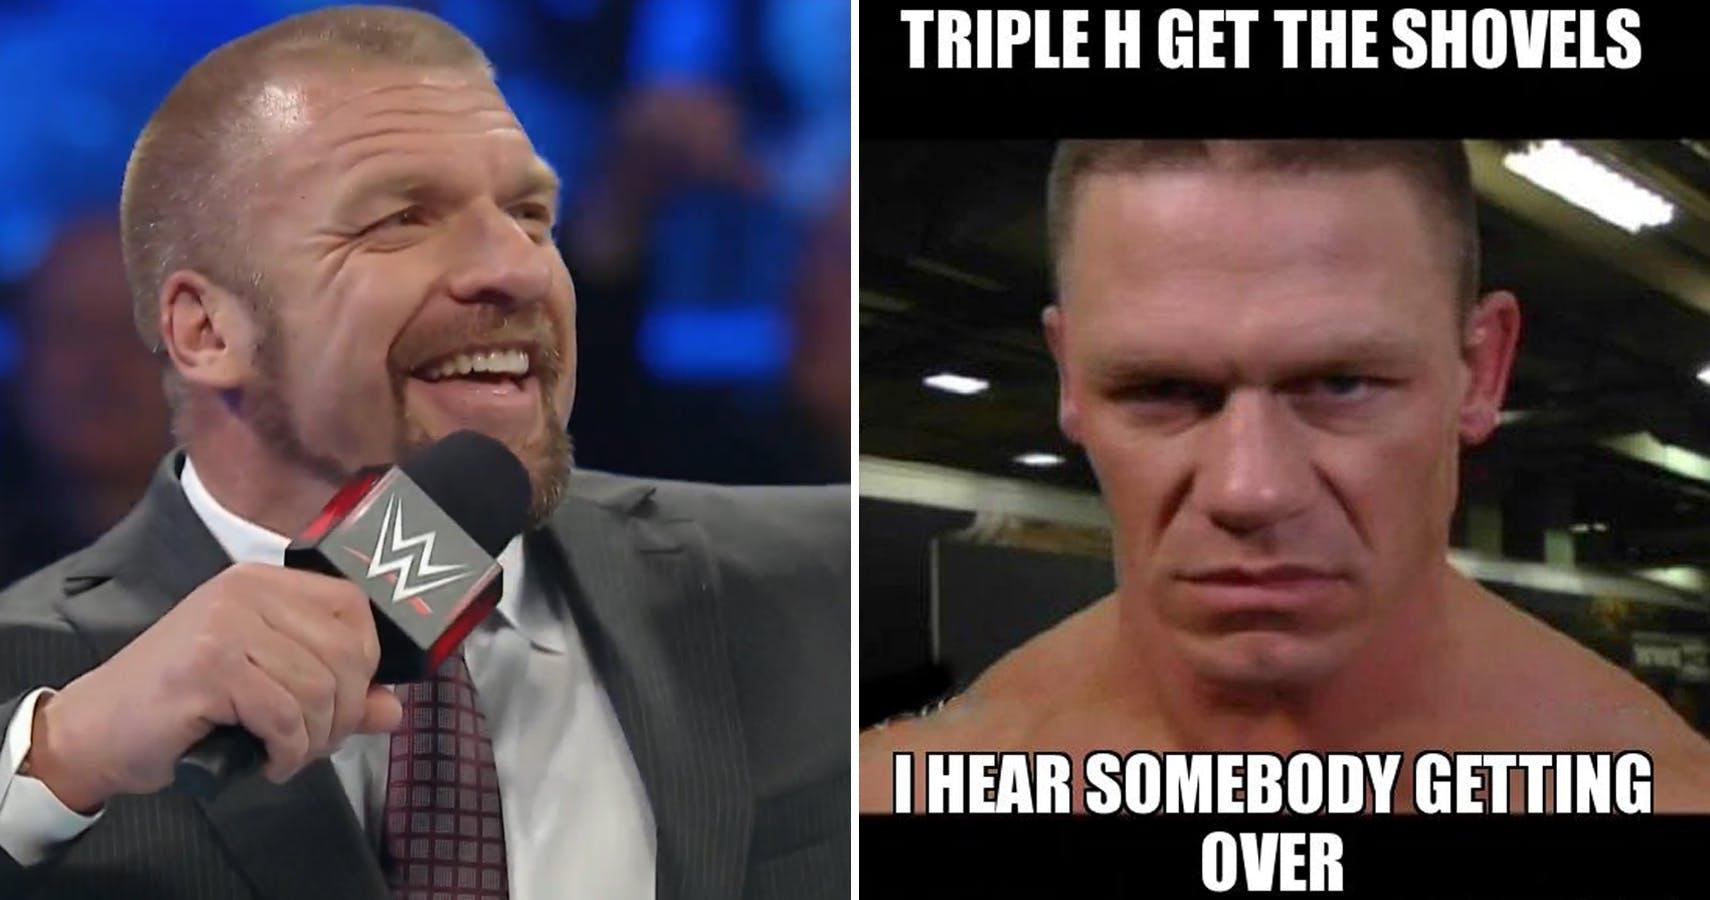 Triple H Get The Triple H Meme